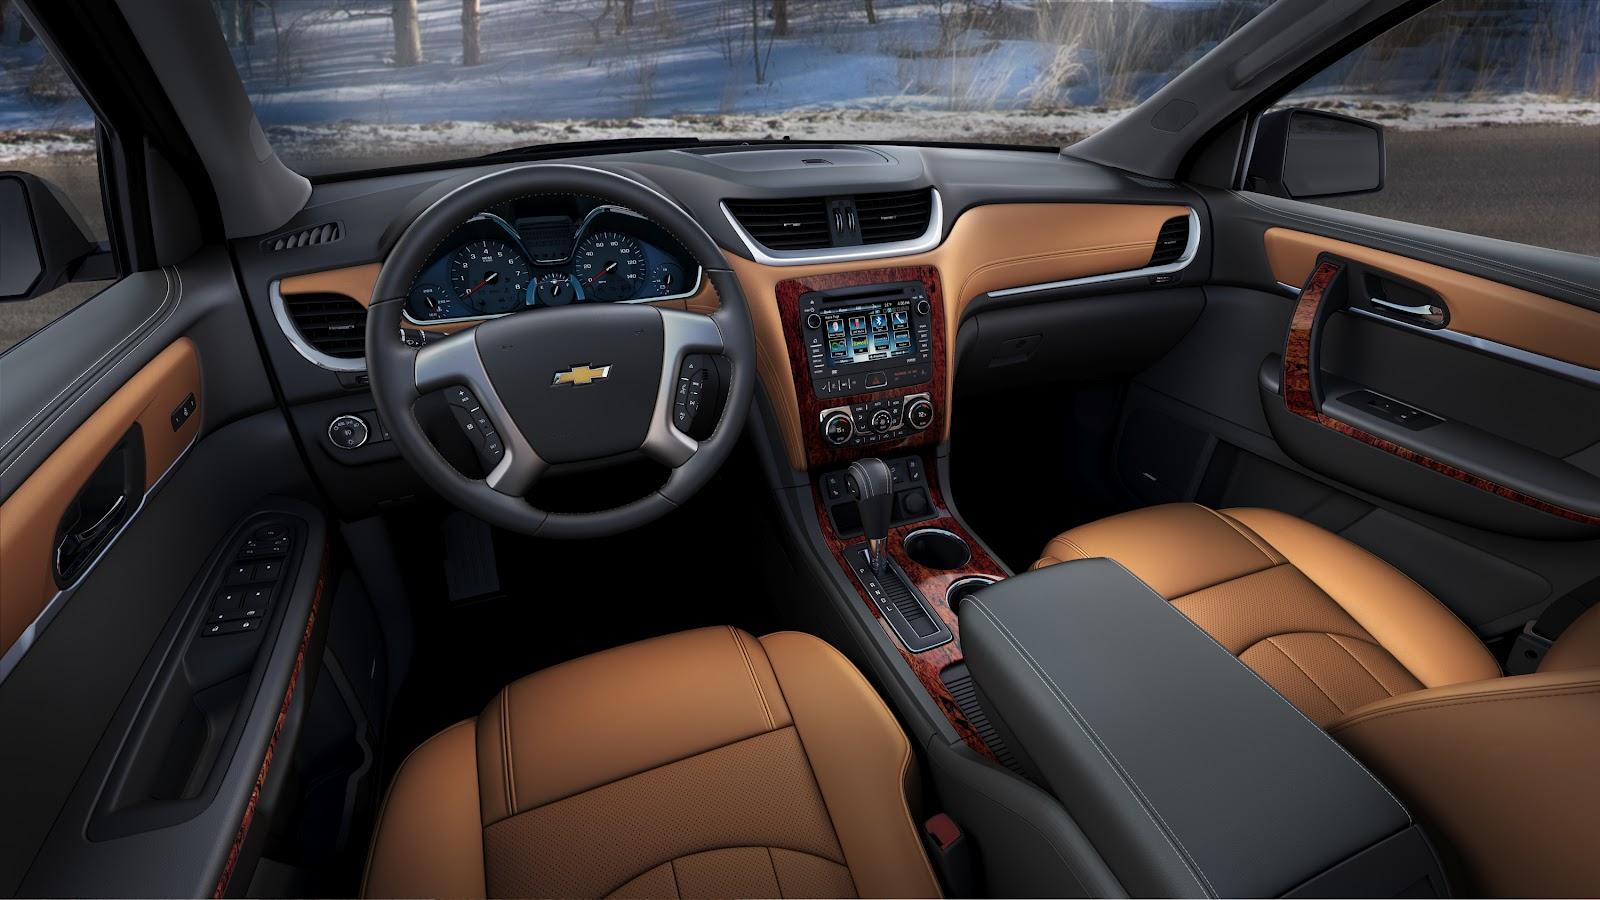 chevrolet - 2009 - [Chevrolet] traverse 2013+chevrolet+traverse+8